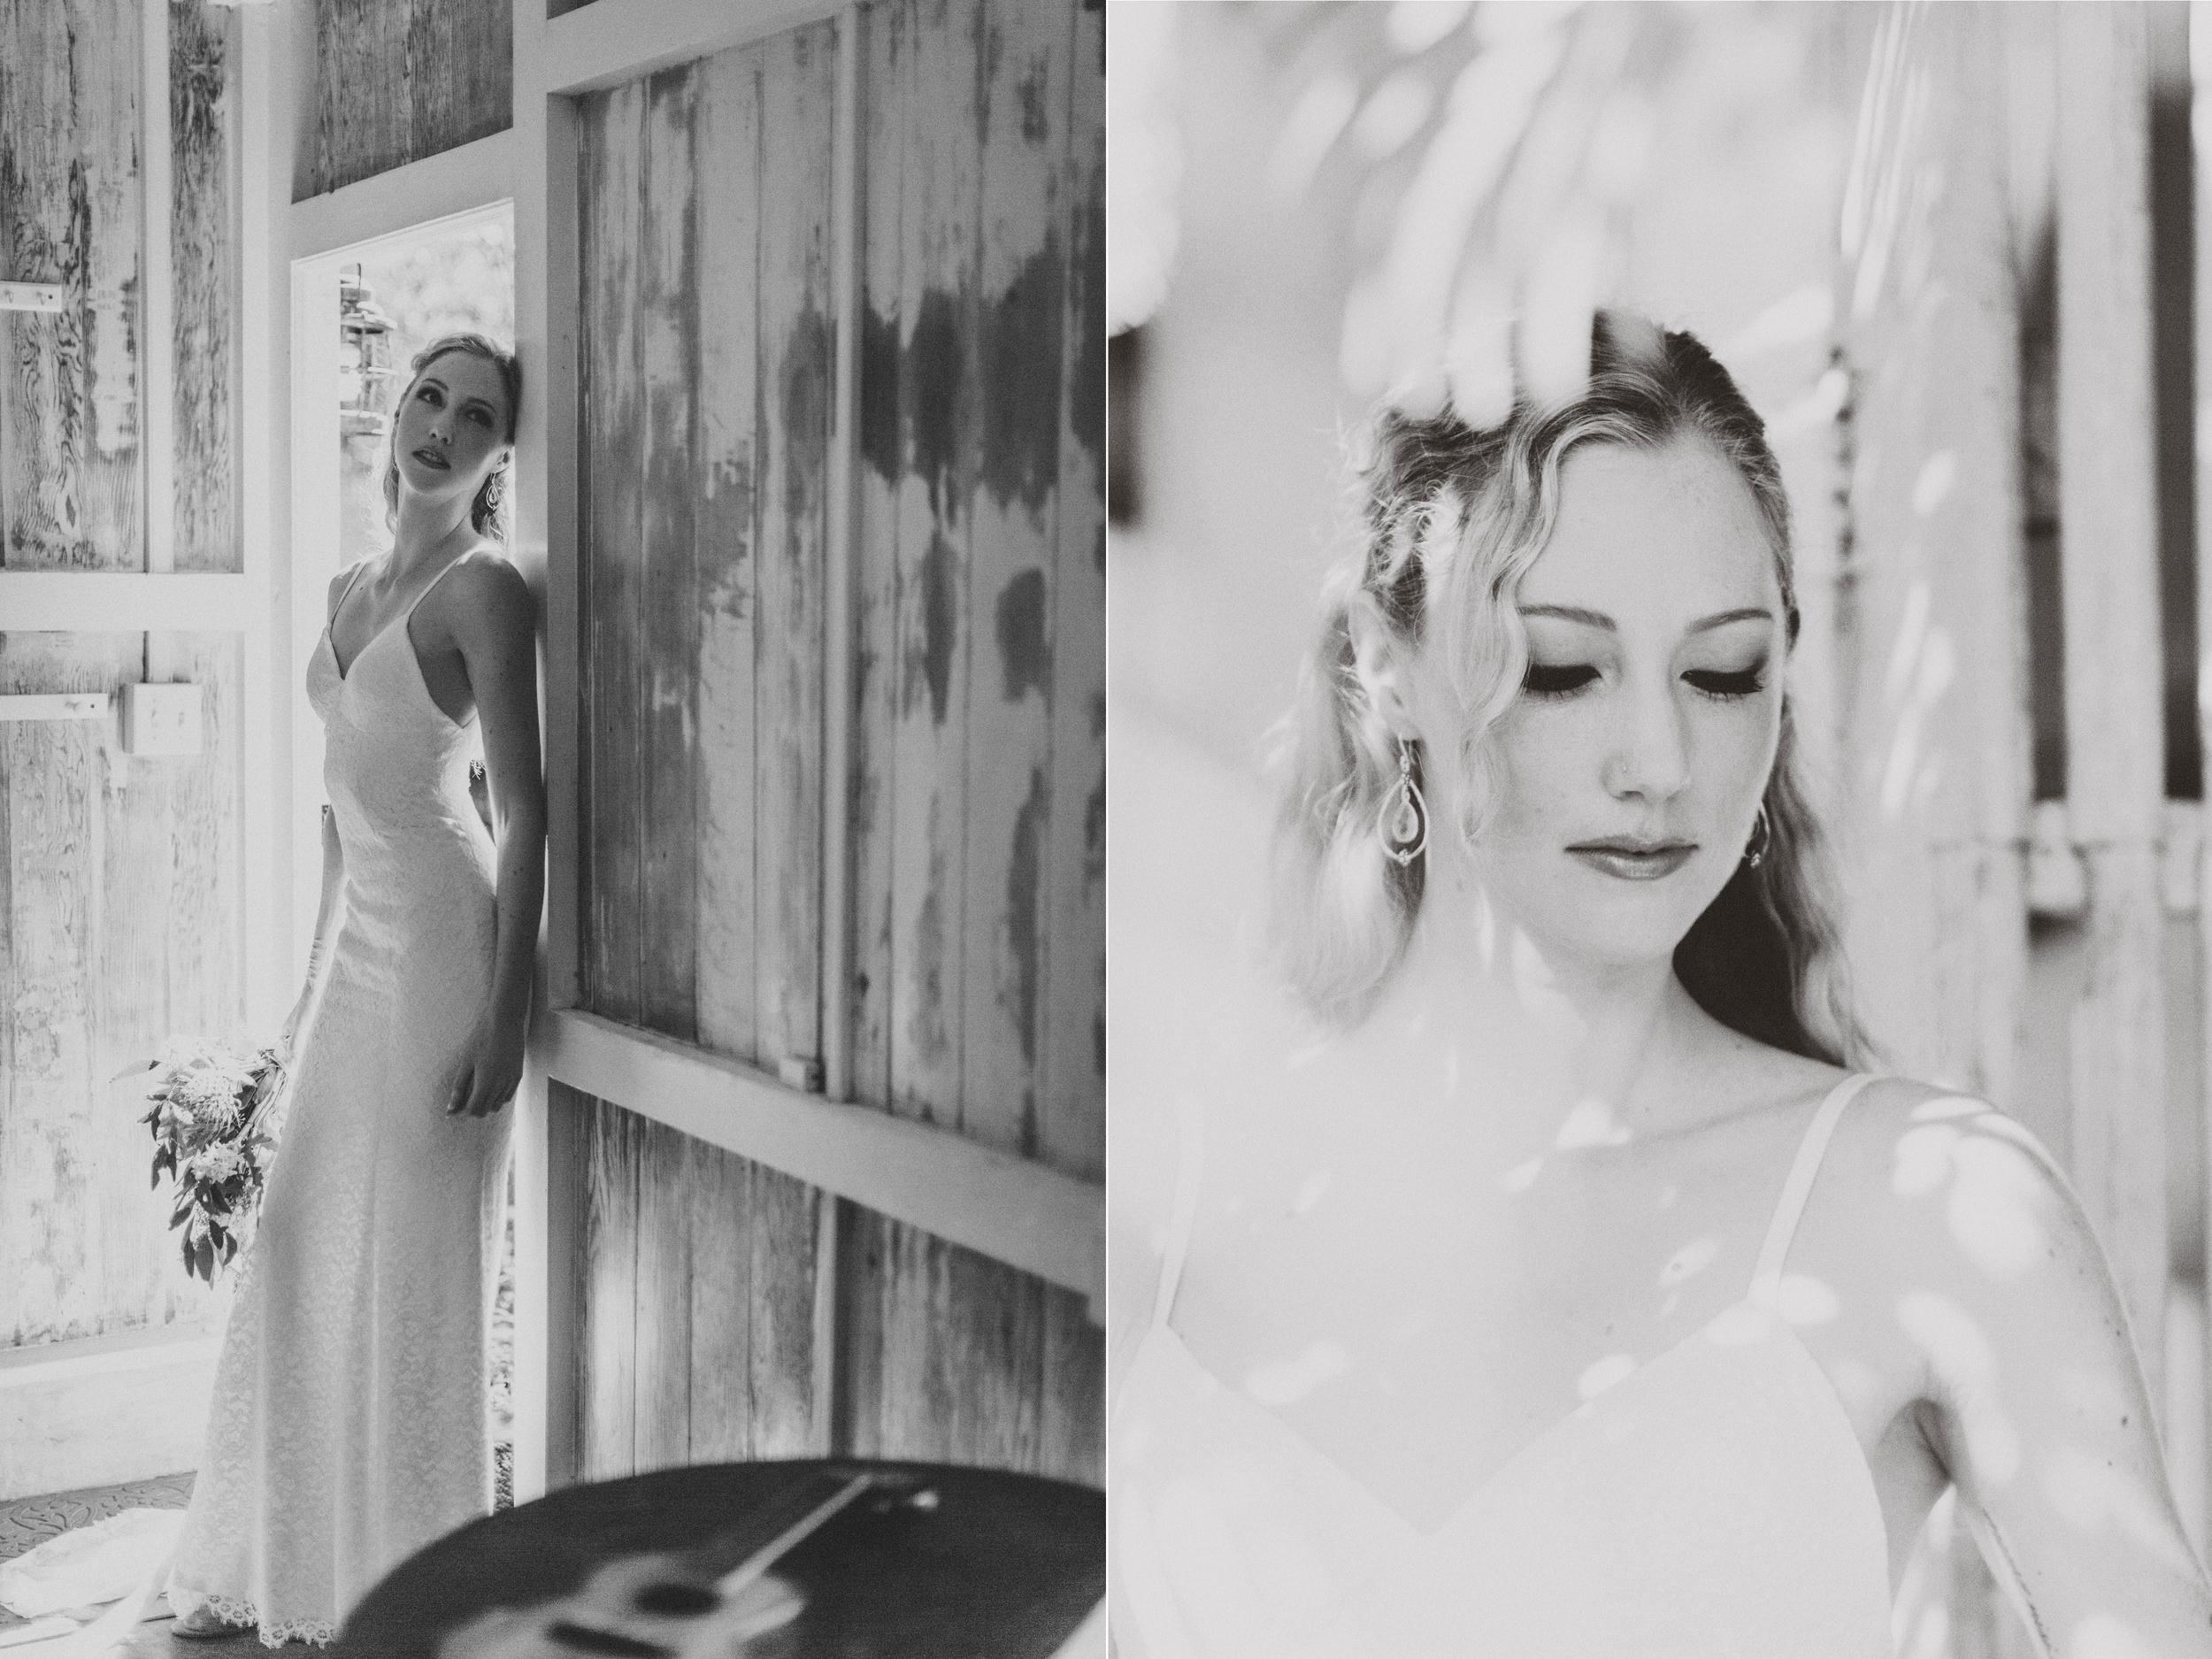 angie-diaz-photography-maui-wedding-35.jpg